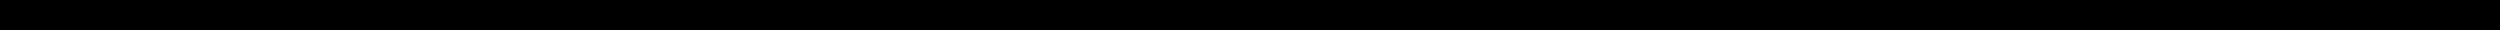 black2.jpg